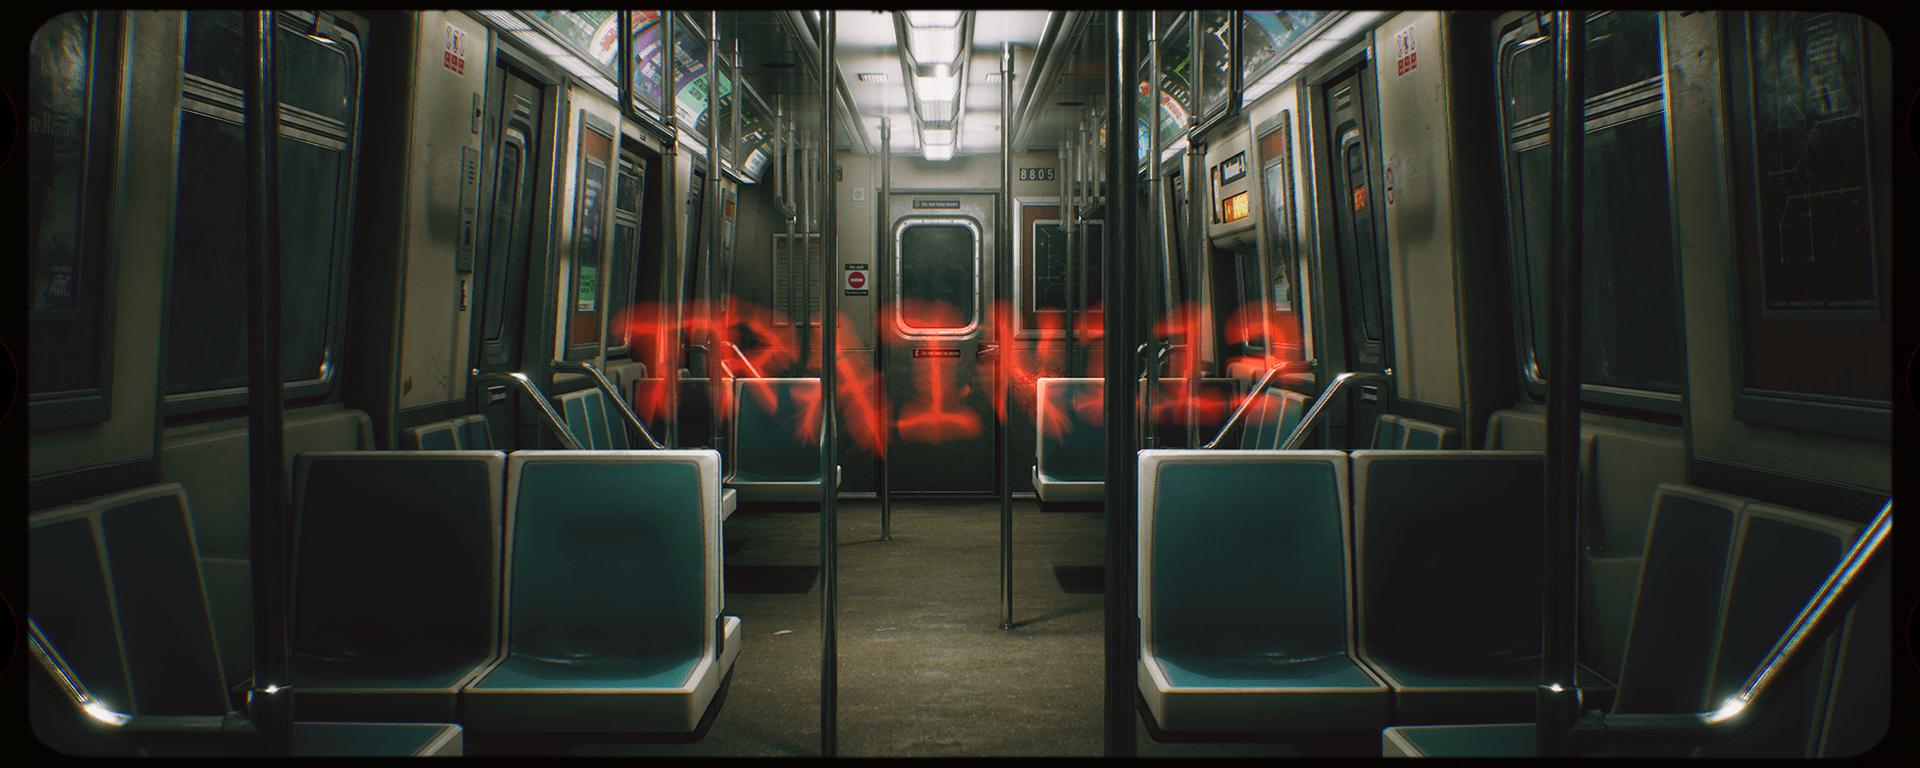 Train 113 - Horrorgame